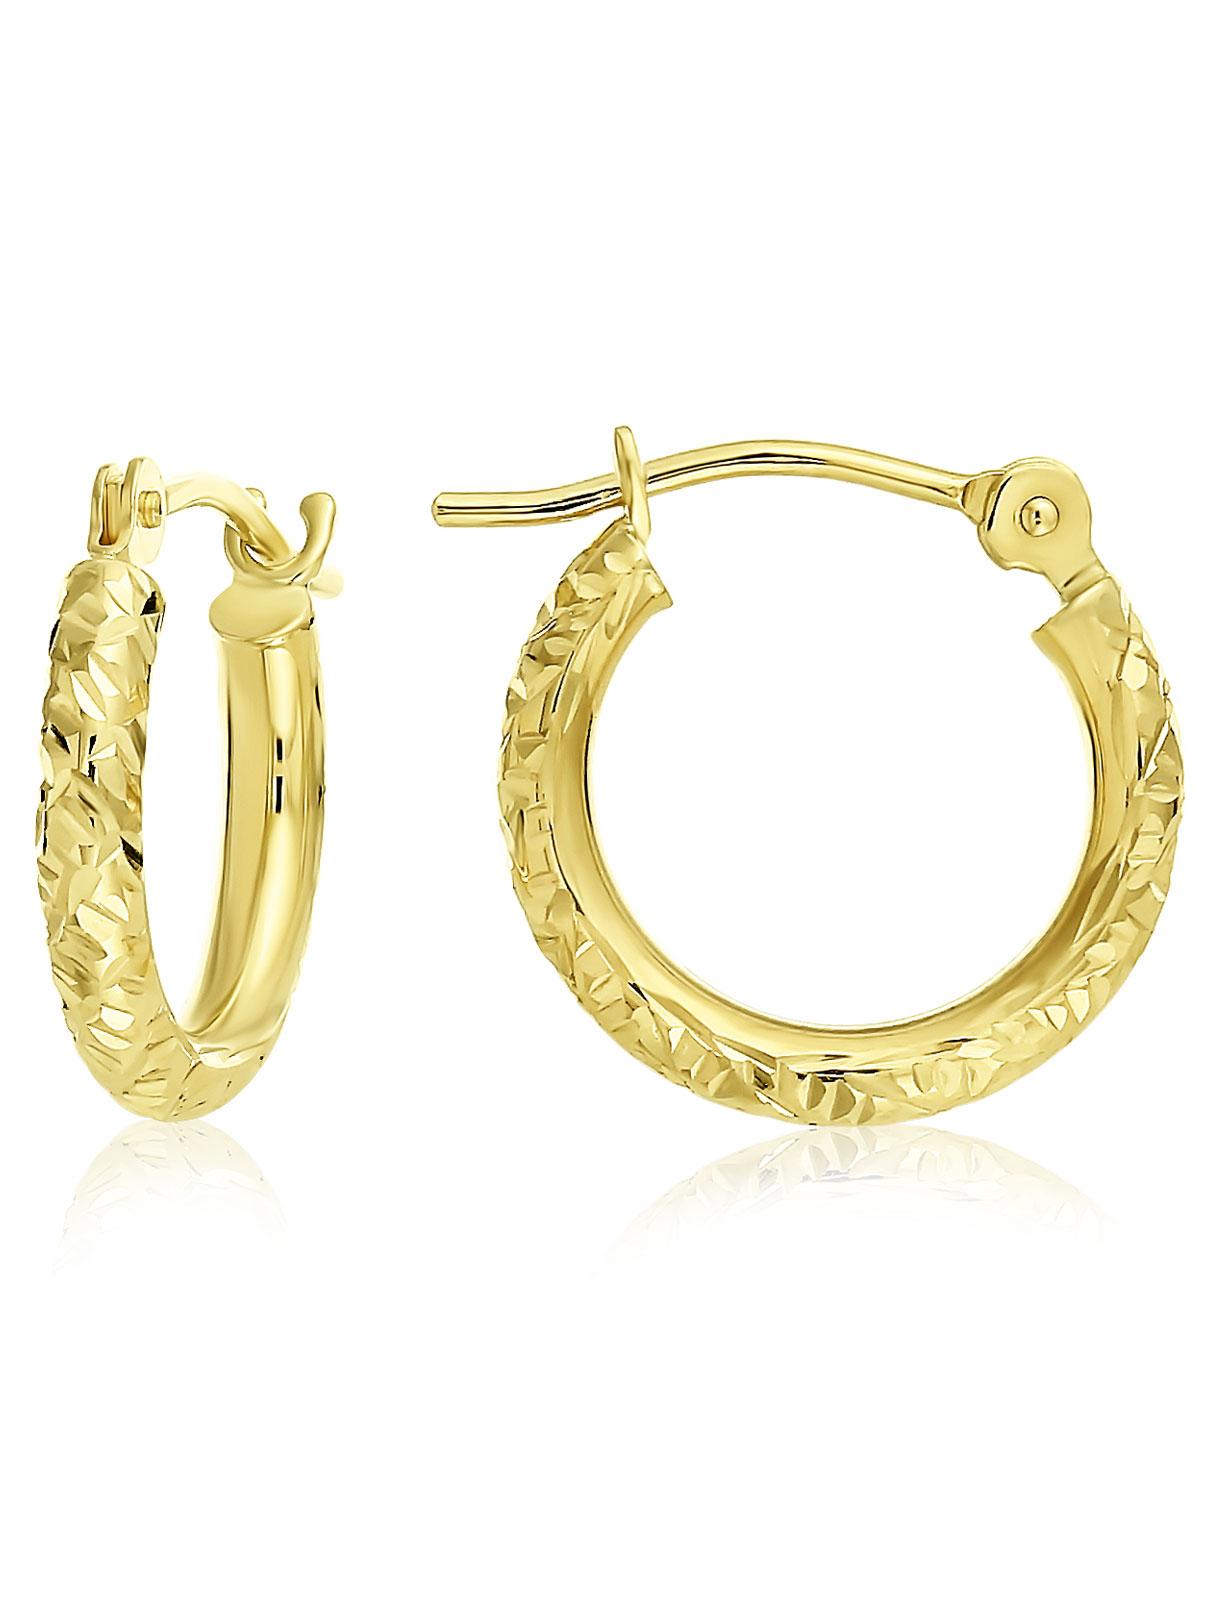 14k Yellow Gold Hand Engraved Round Hoop Earrings for Children - 0.5 Inch Diameter